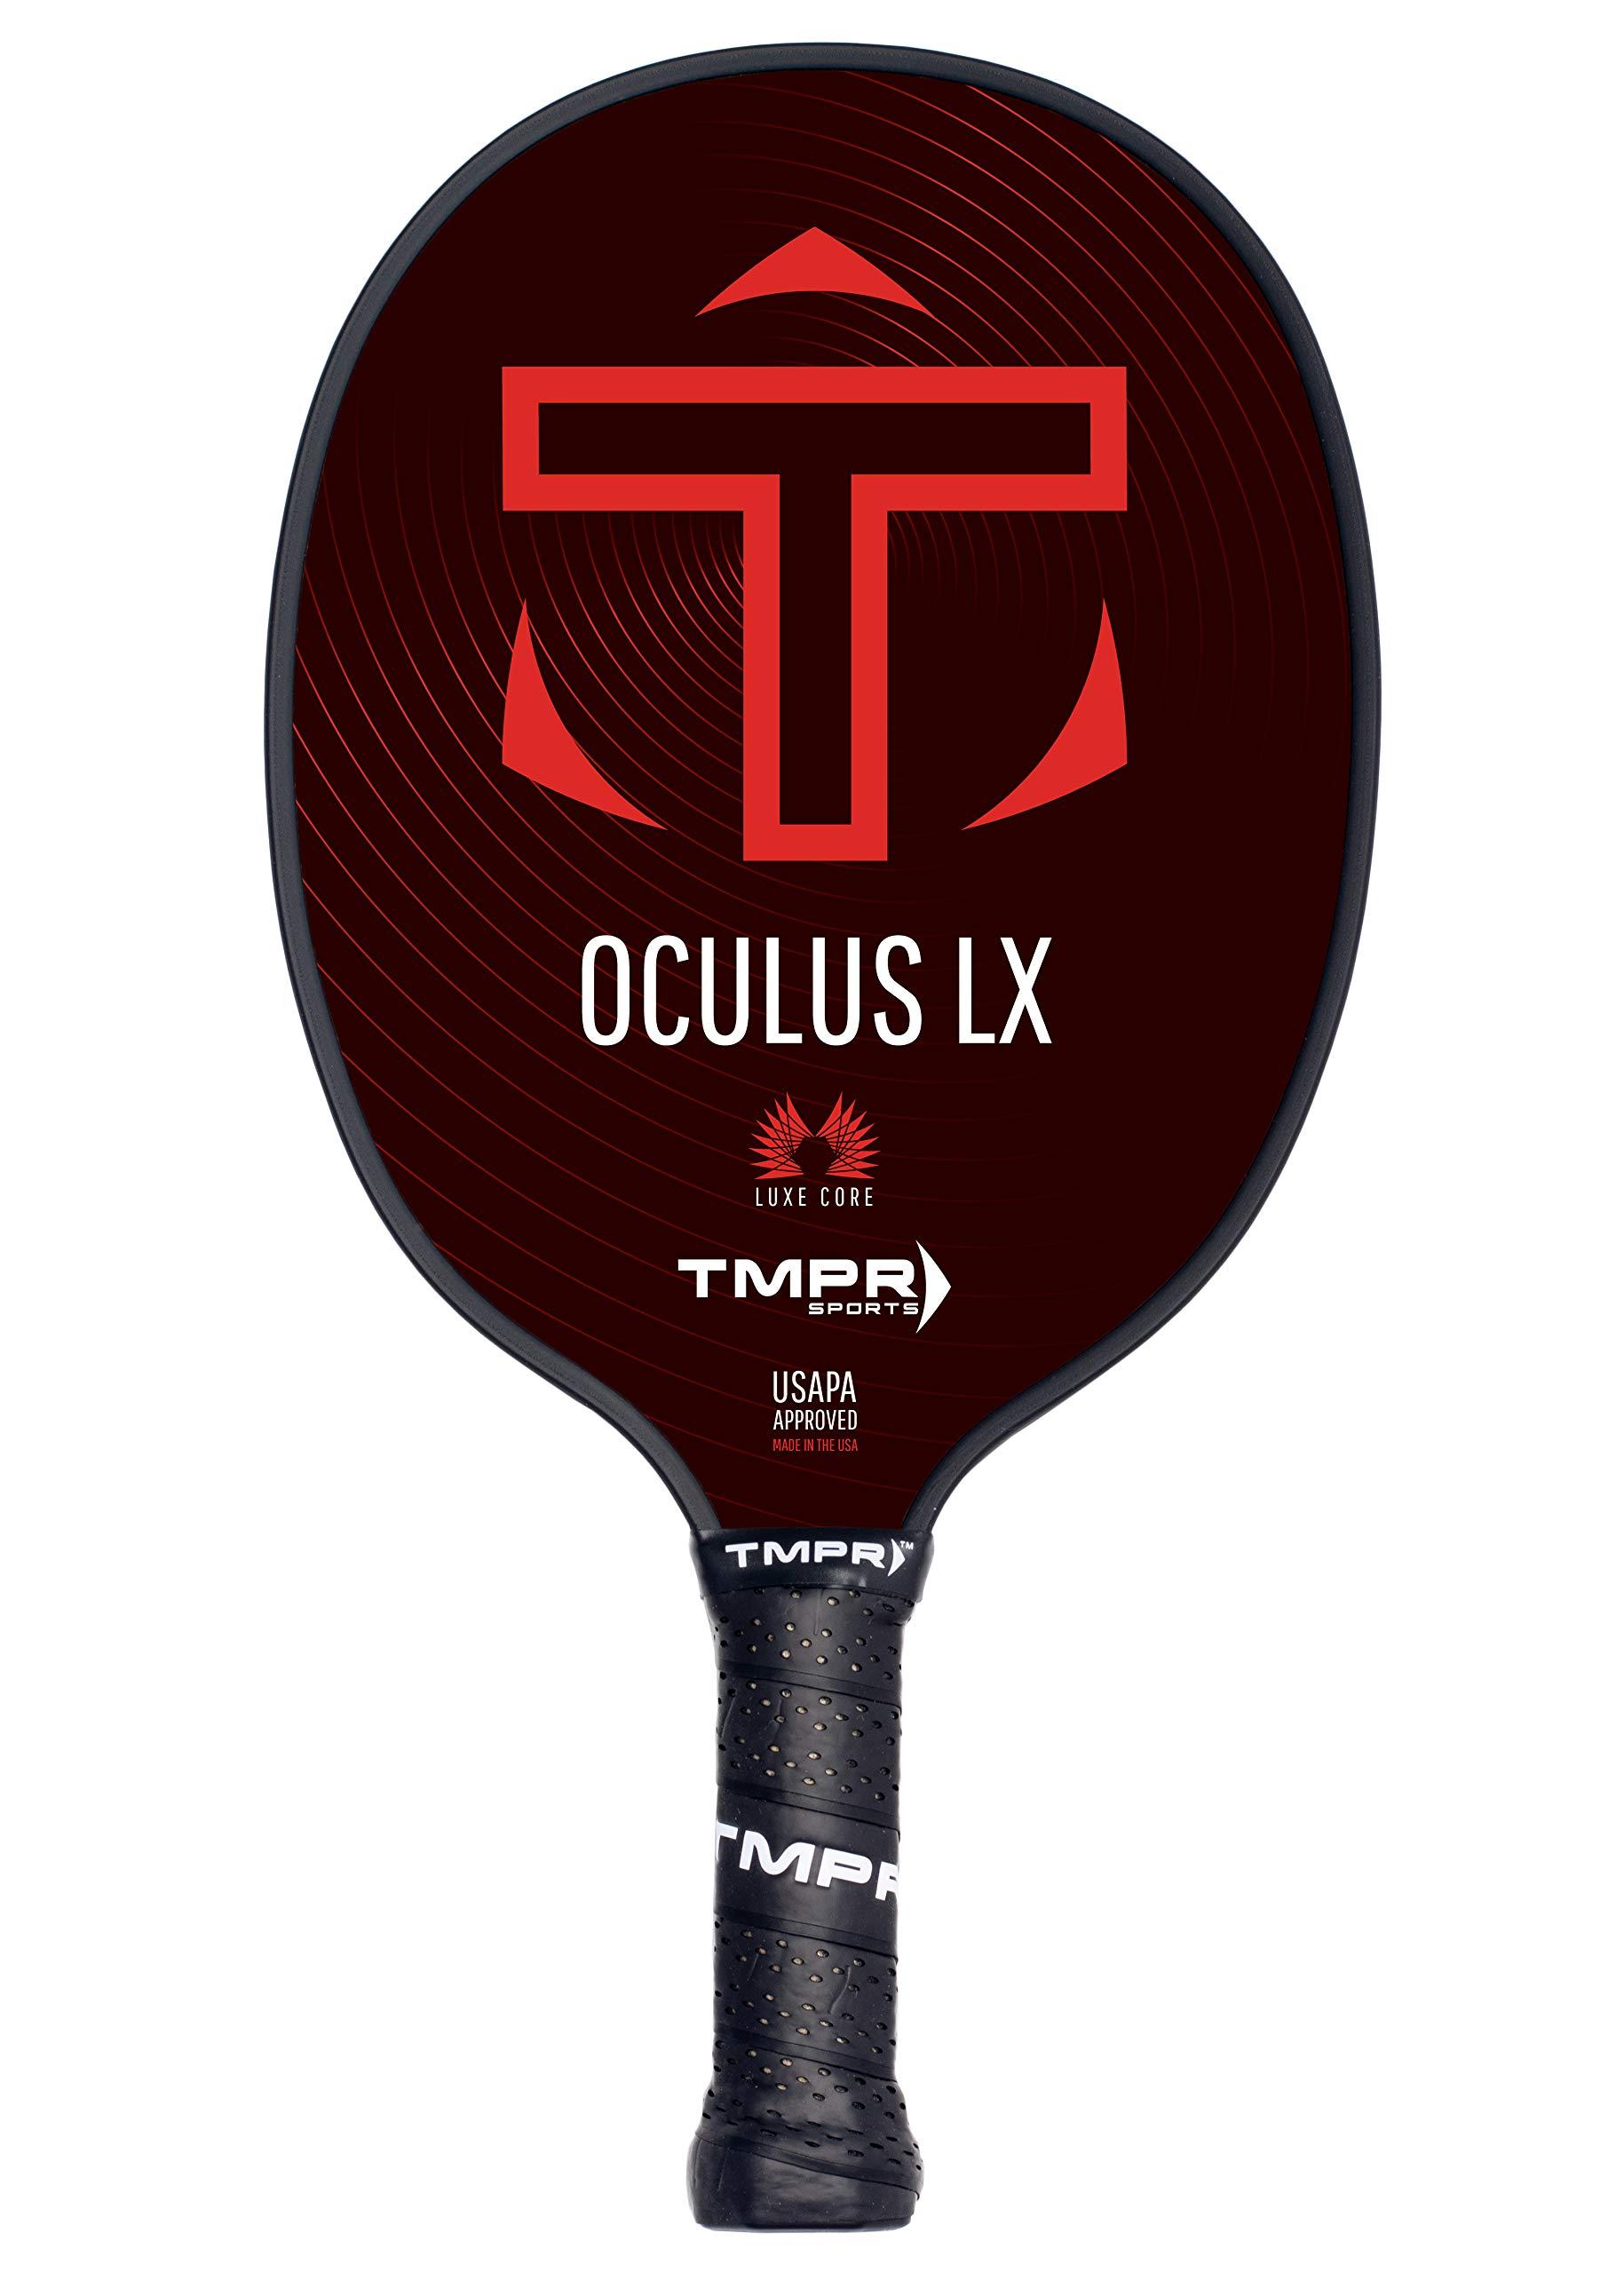 TMPR Sports > Oculus LX > High Performance Honeycomb P -Z7WW